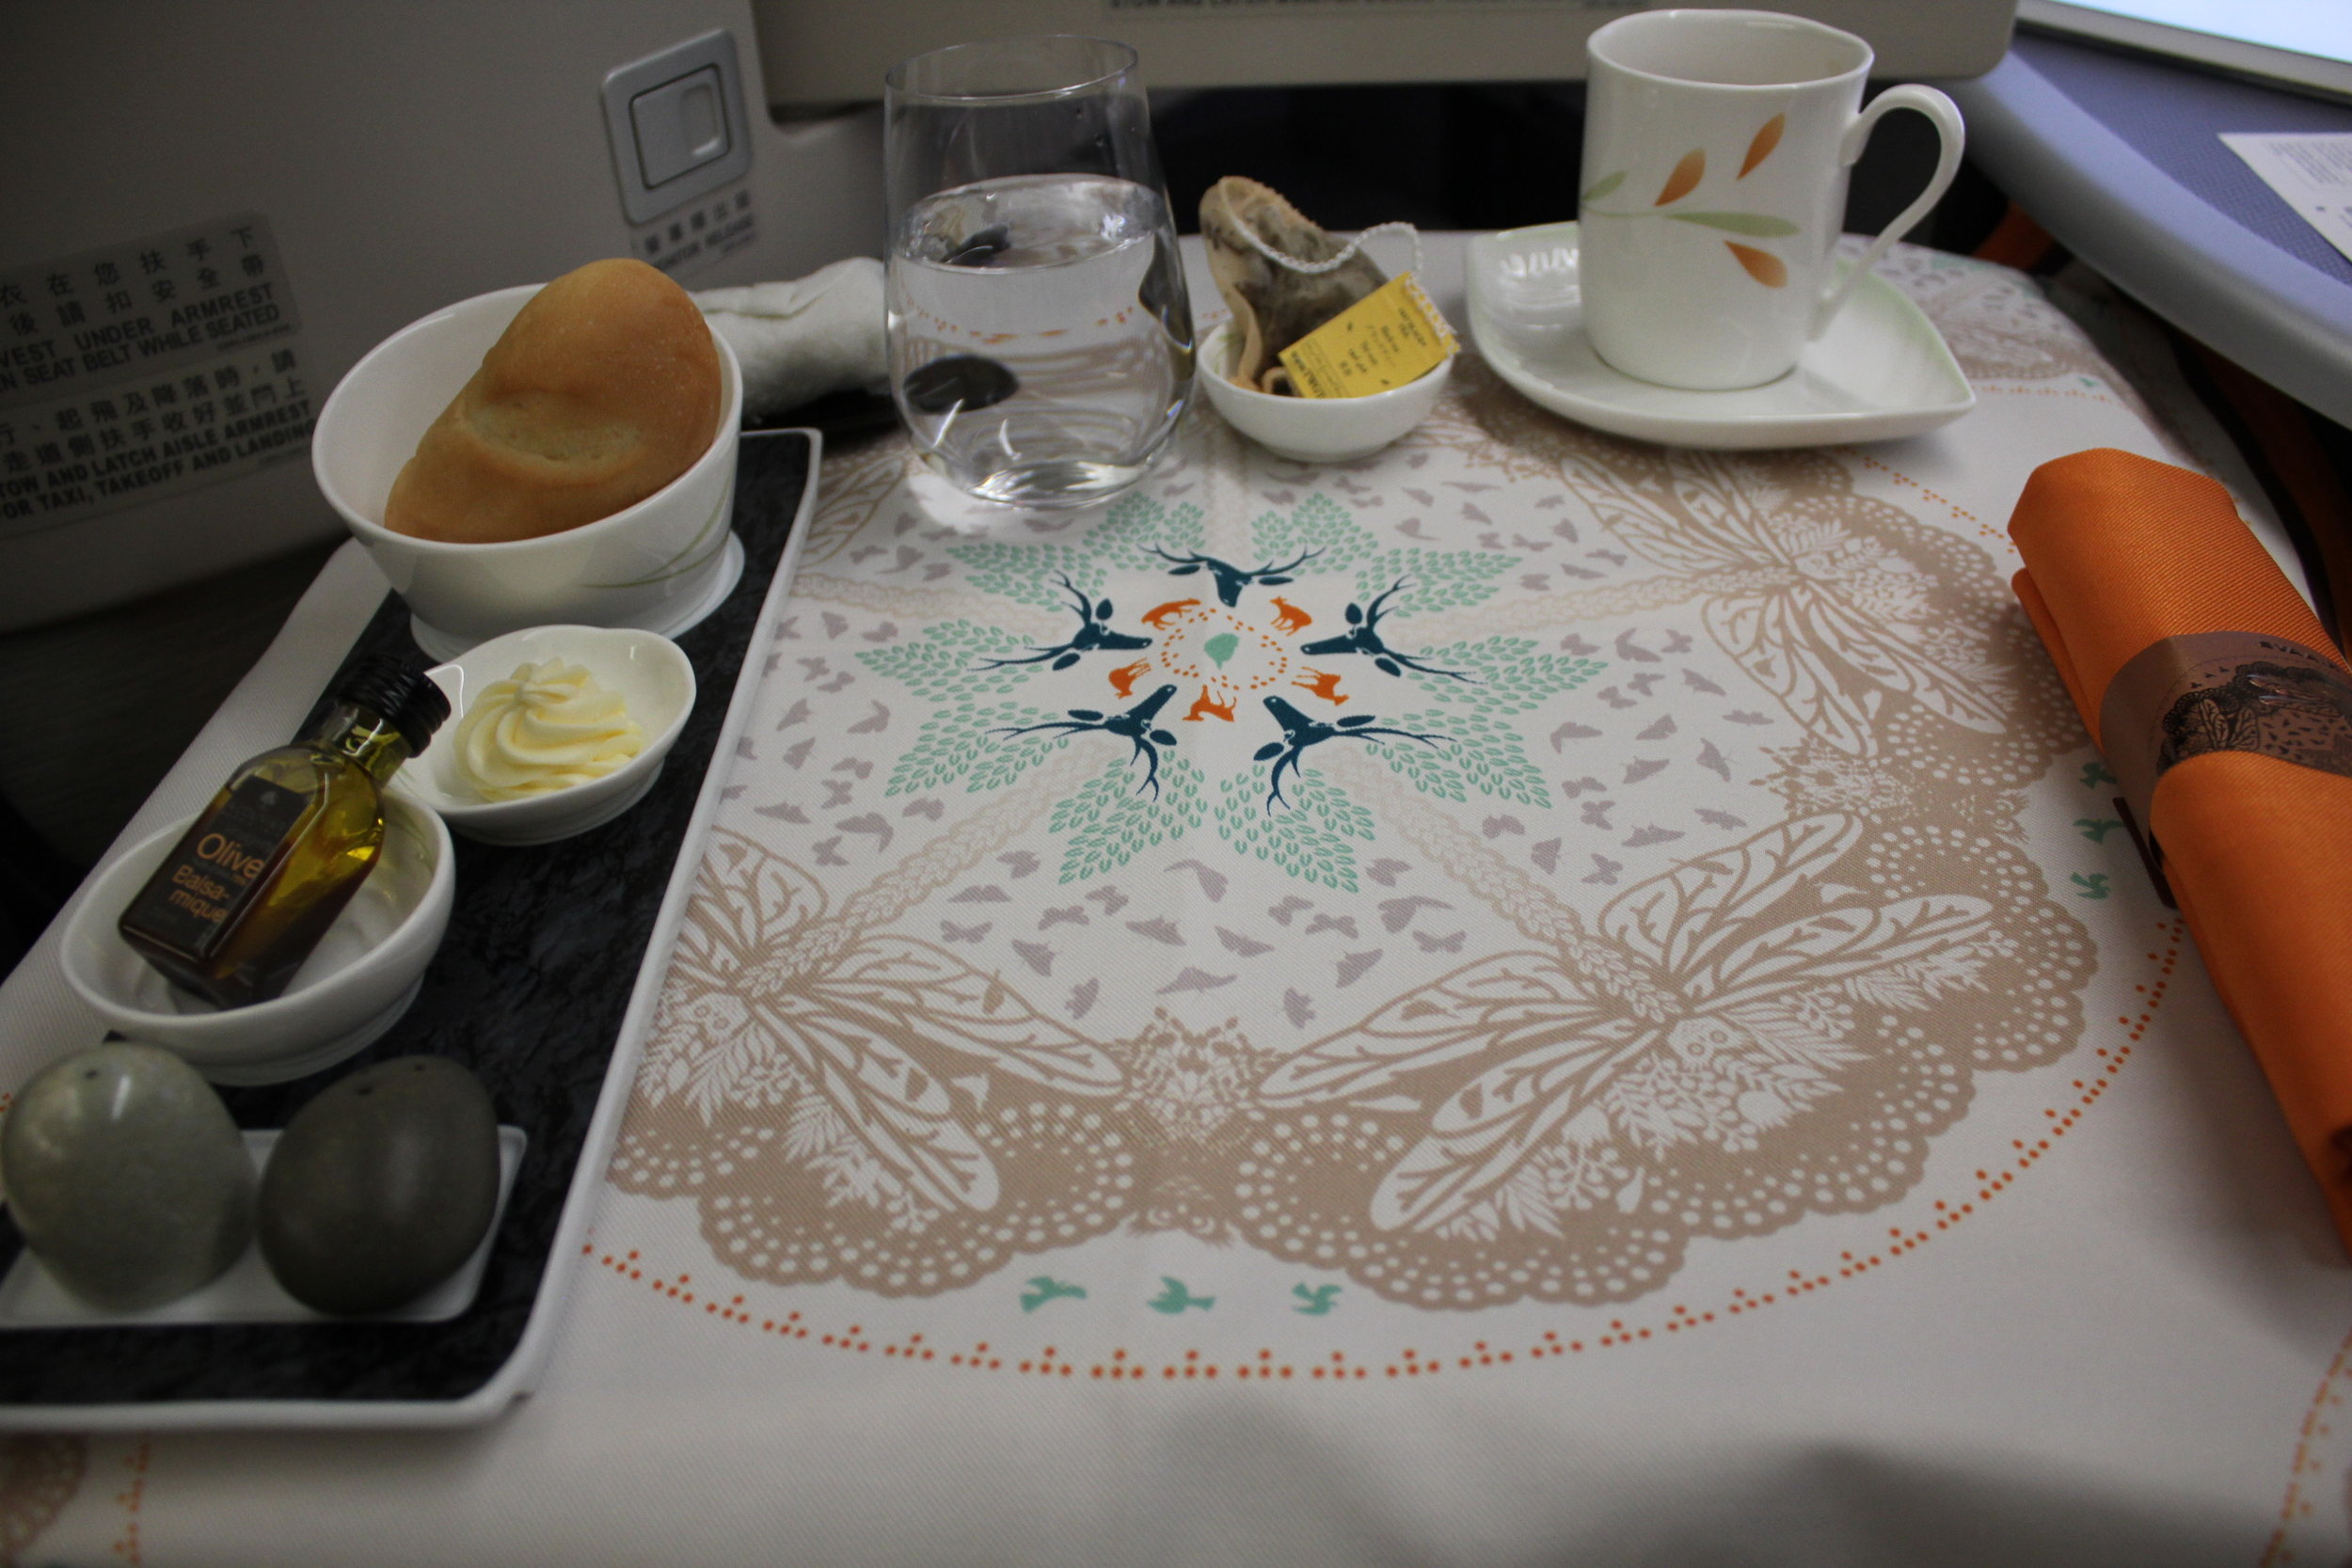 EVA Air business class – Setting the table